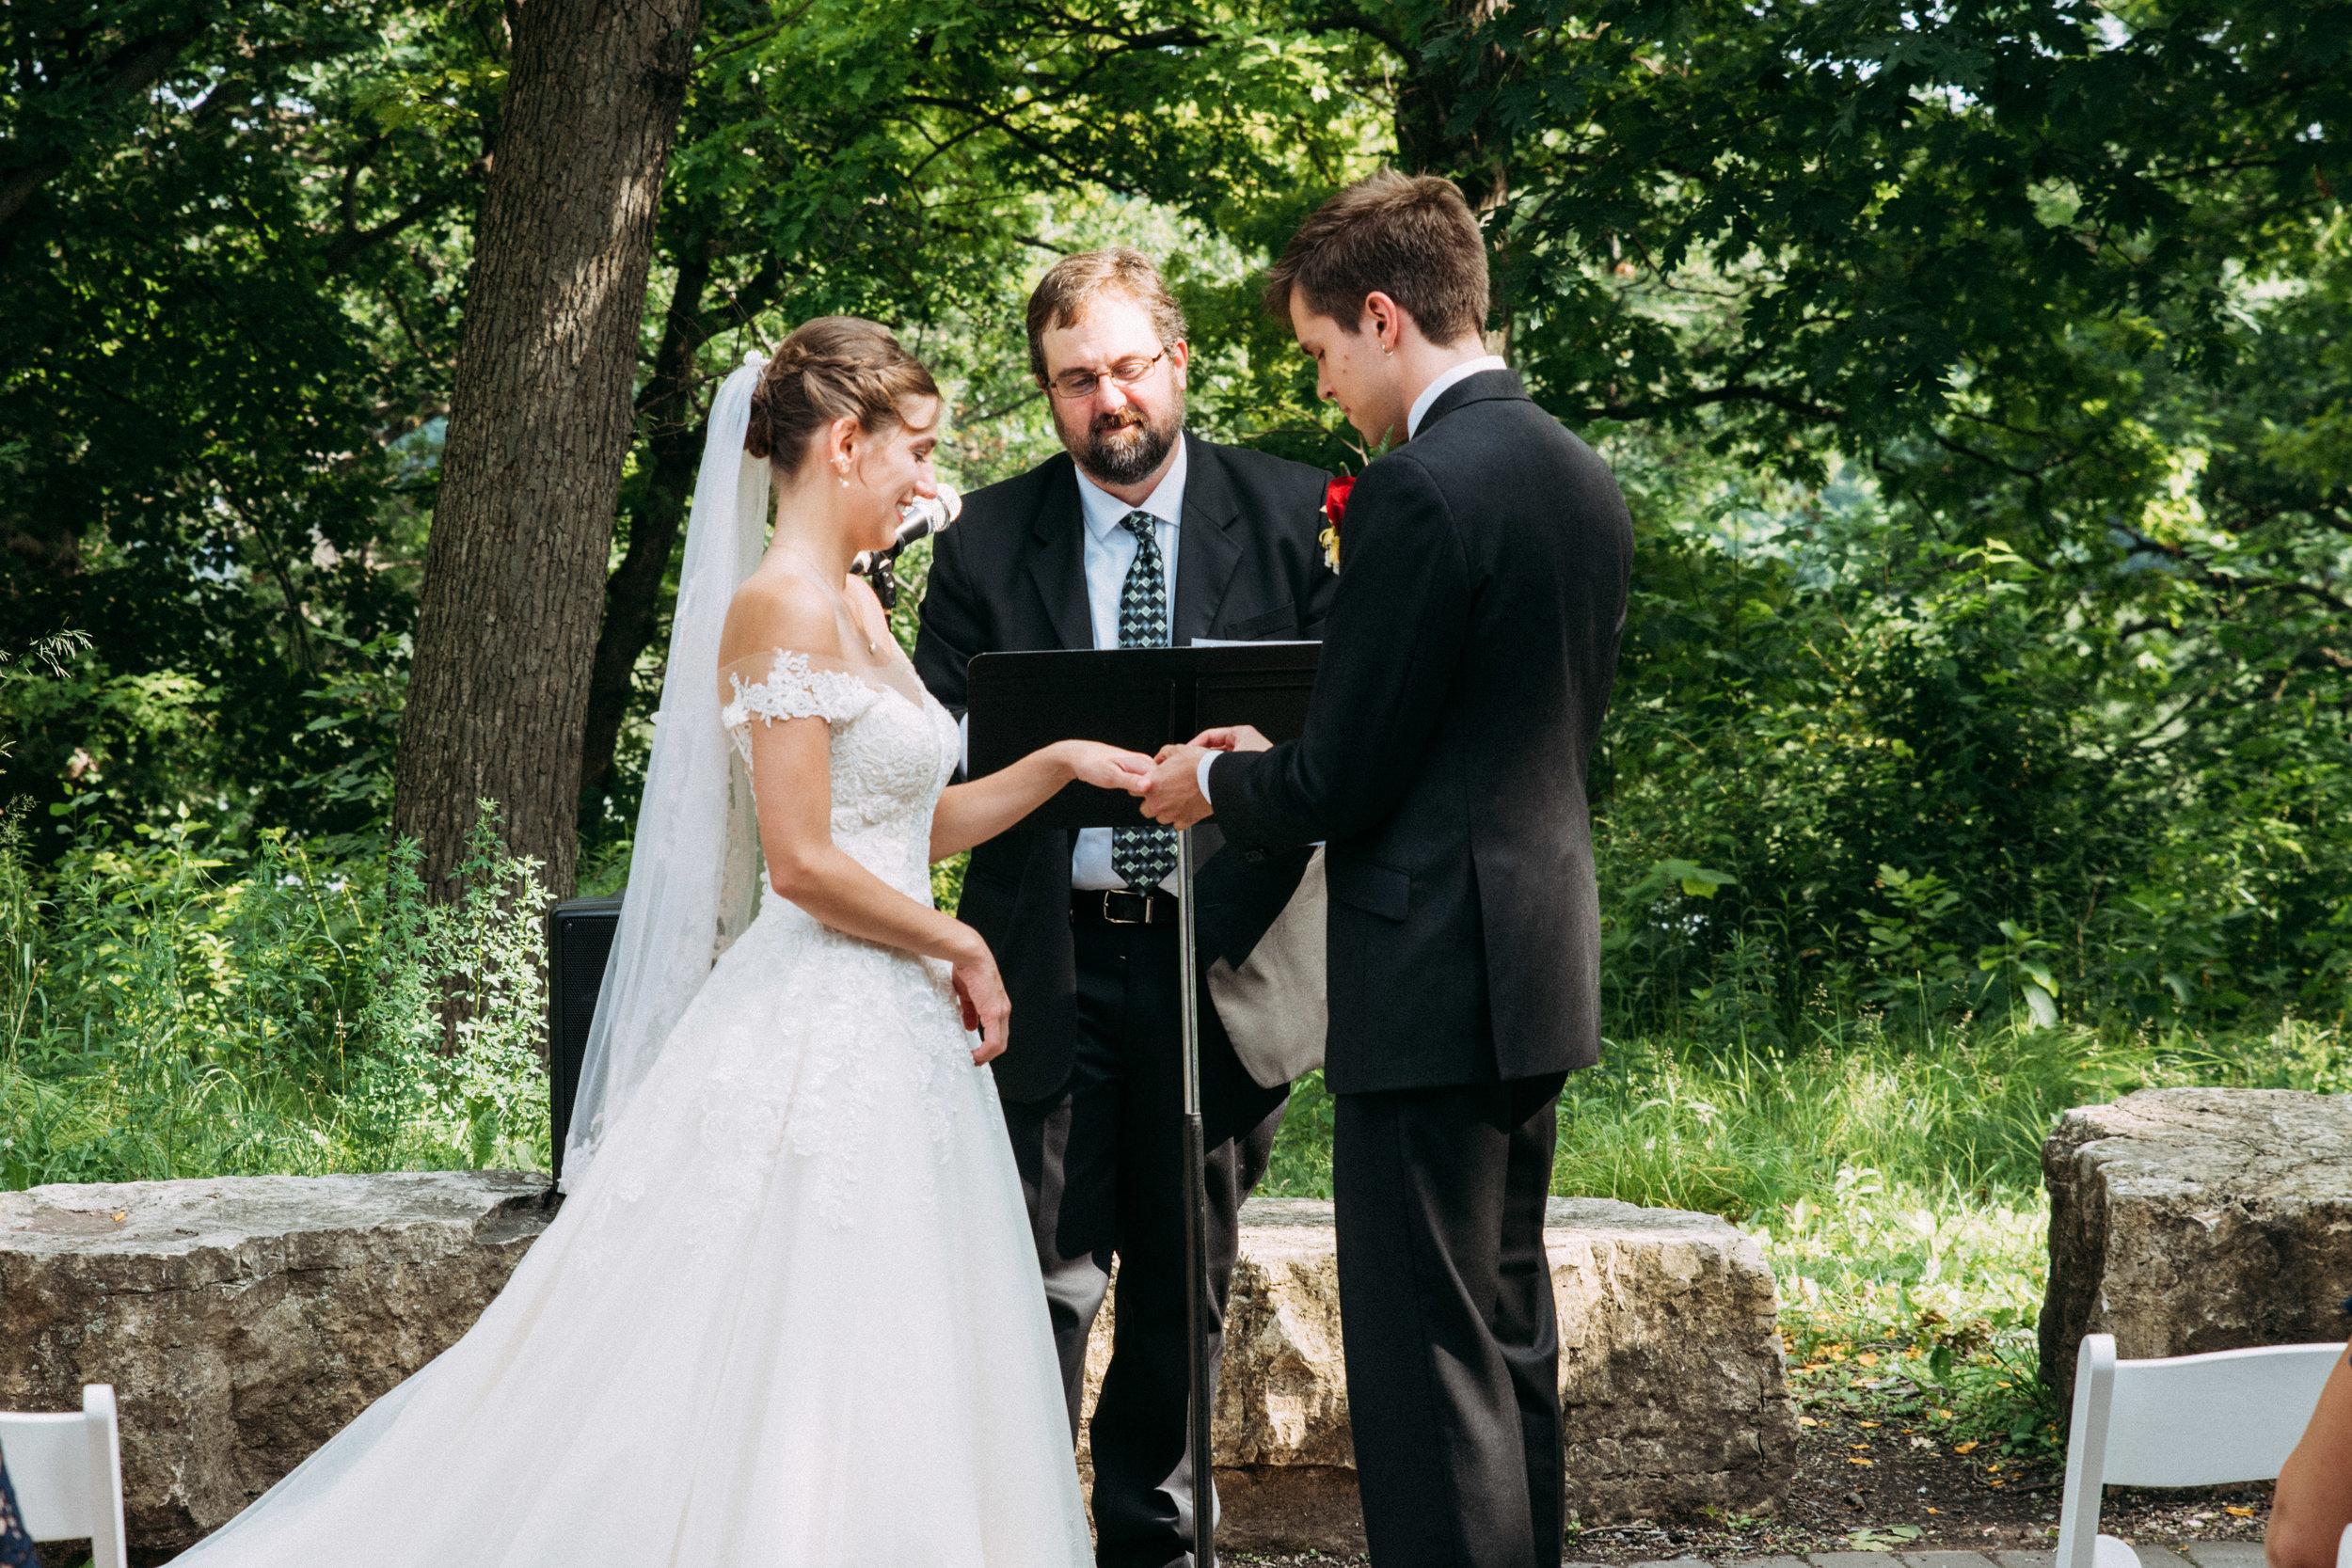 25-Liza_Chris_Minneapolis_Minnesota_Wedding.jpg